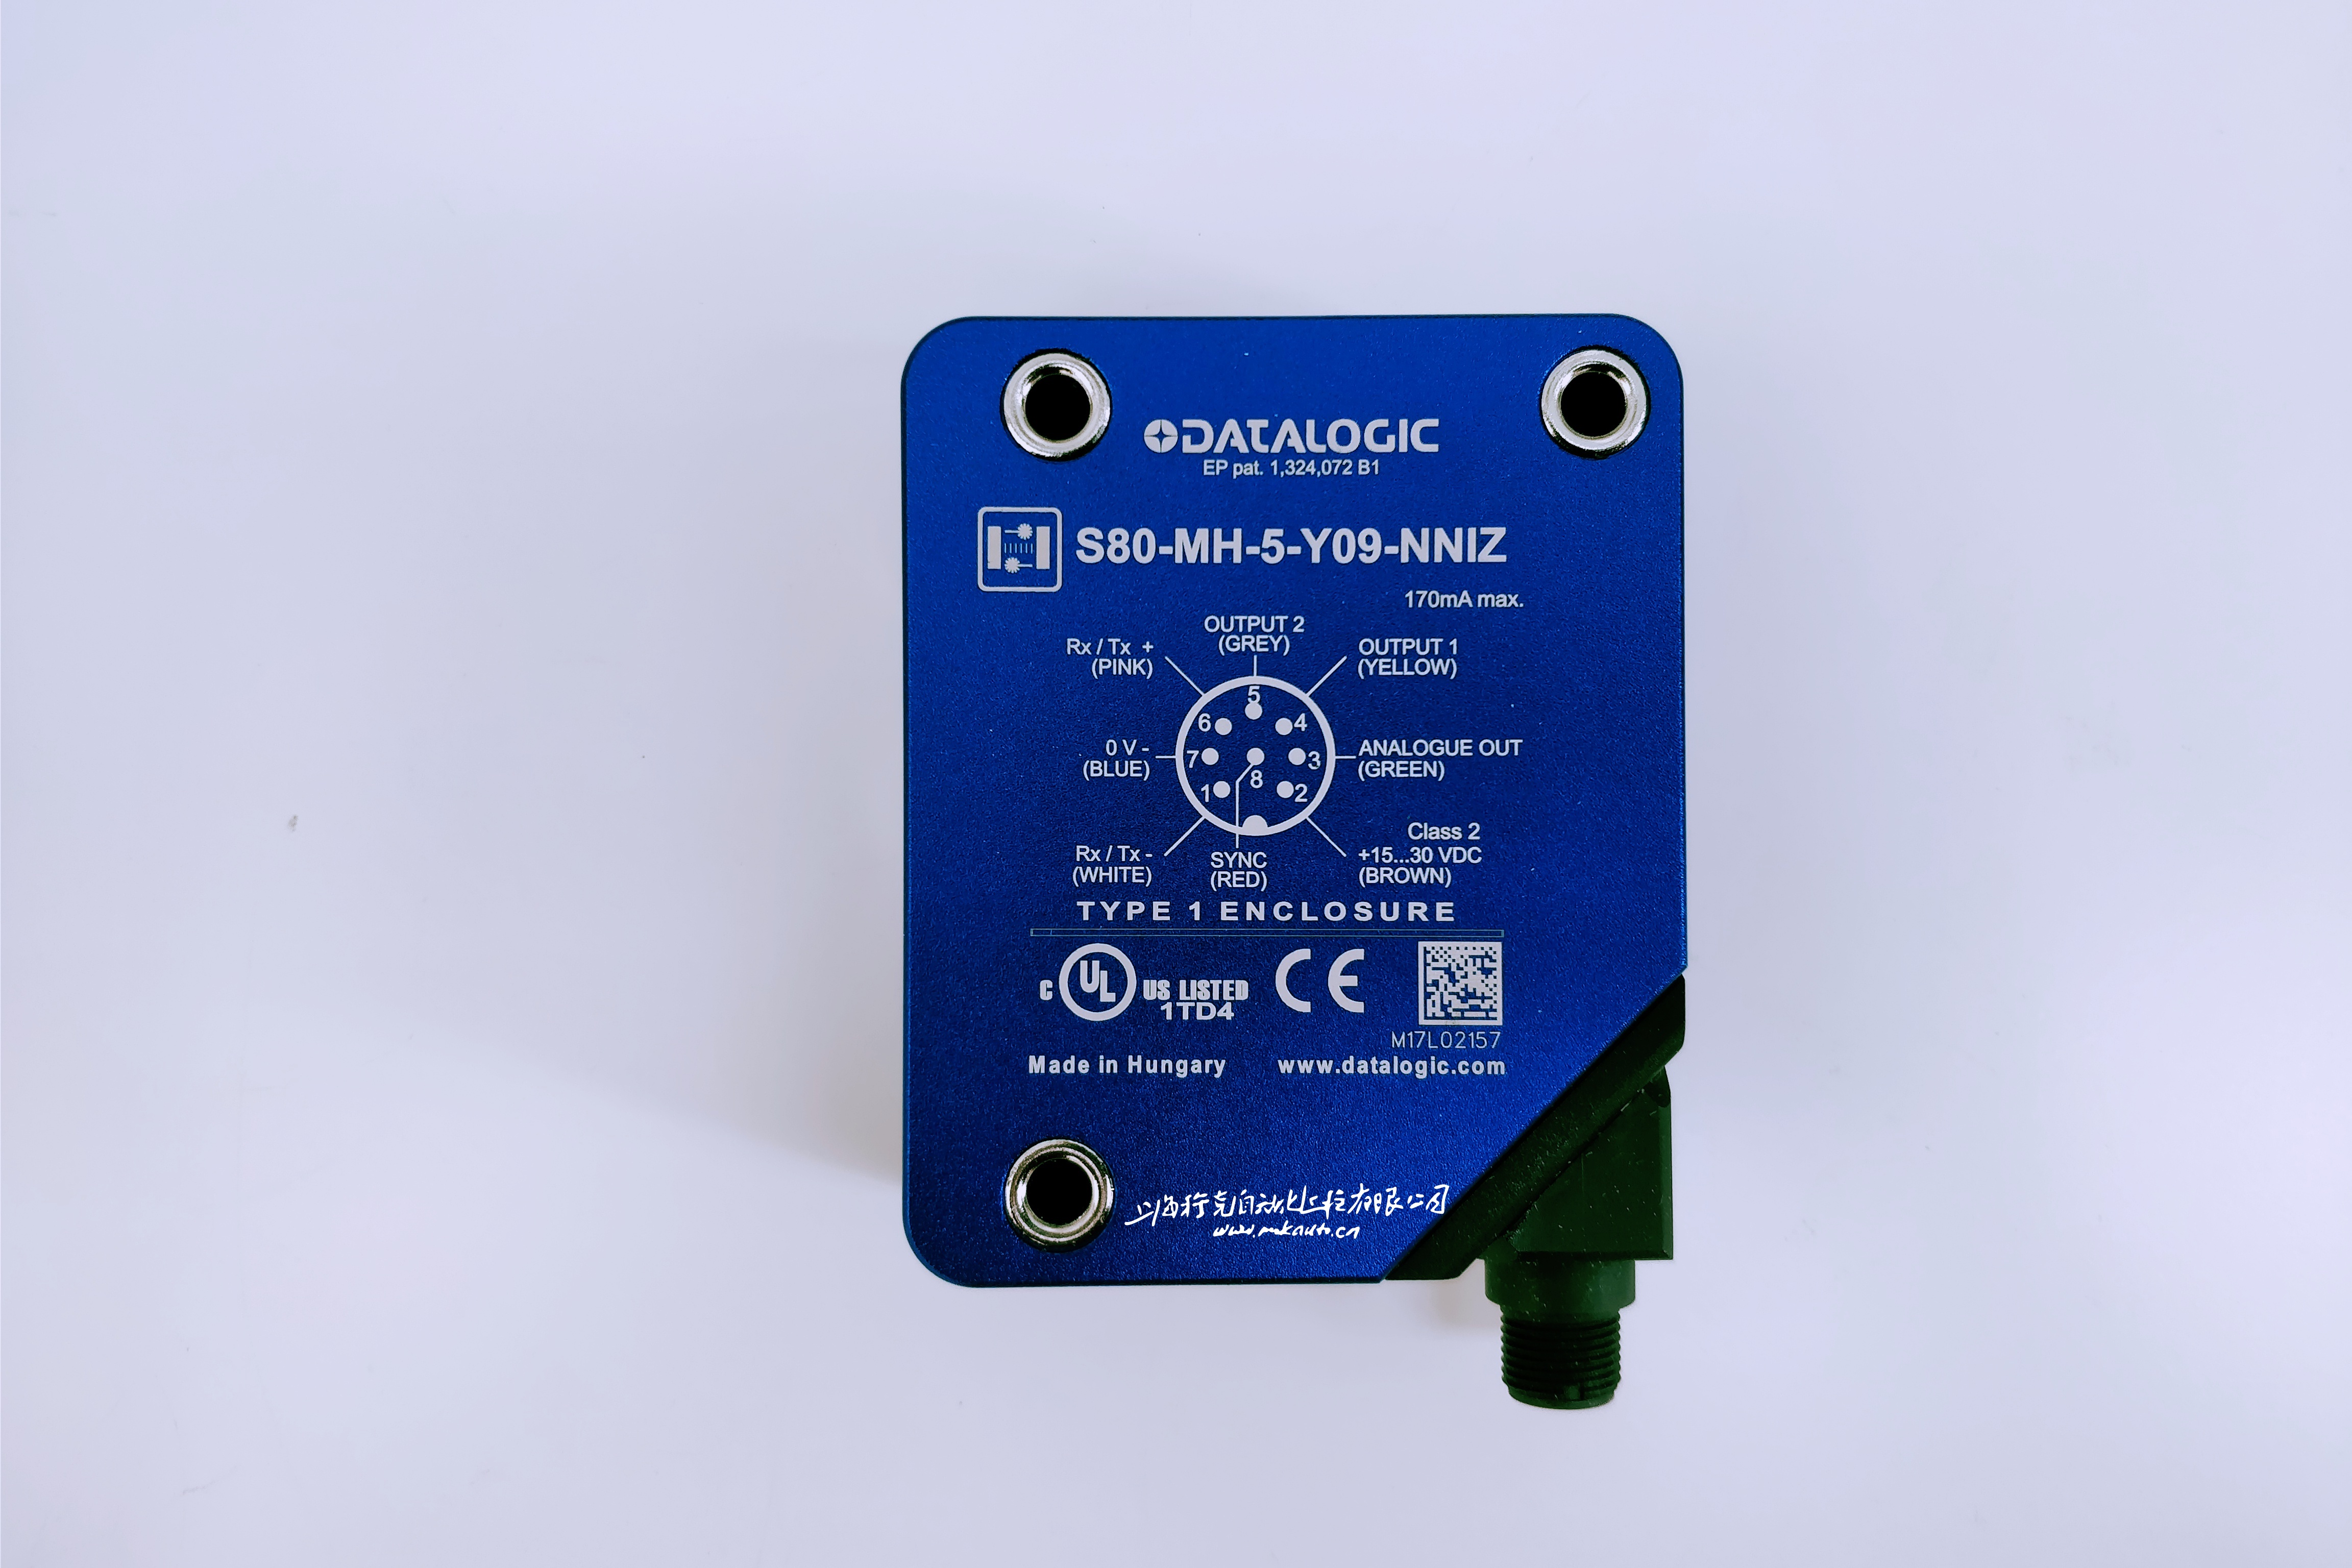 光电开关measurement S80-MH-5-Y09-NNIZ意大利Datalogic特价现货 激光测距传感器